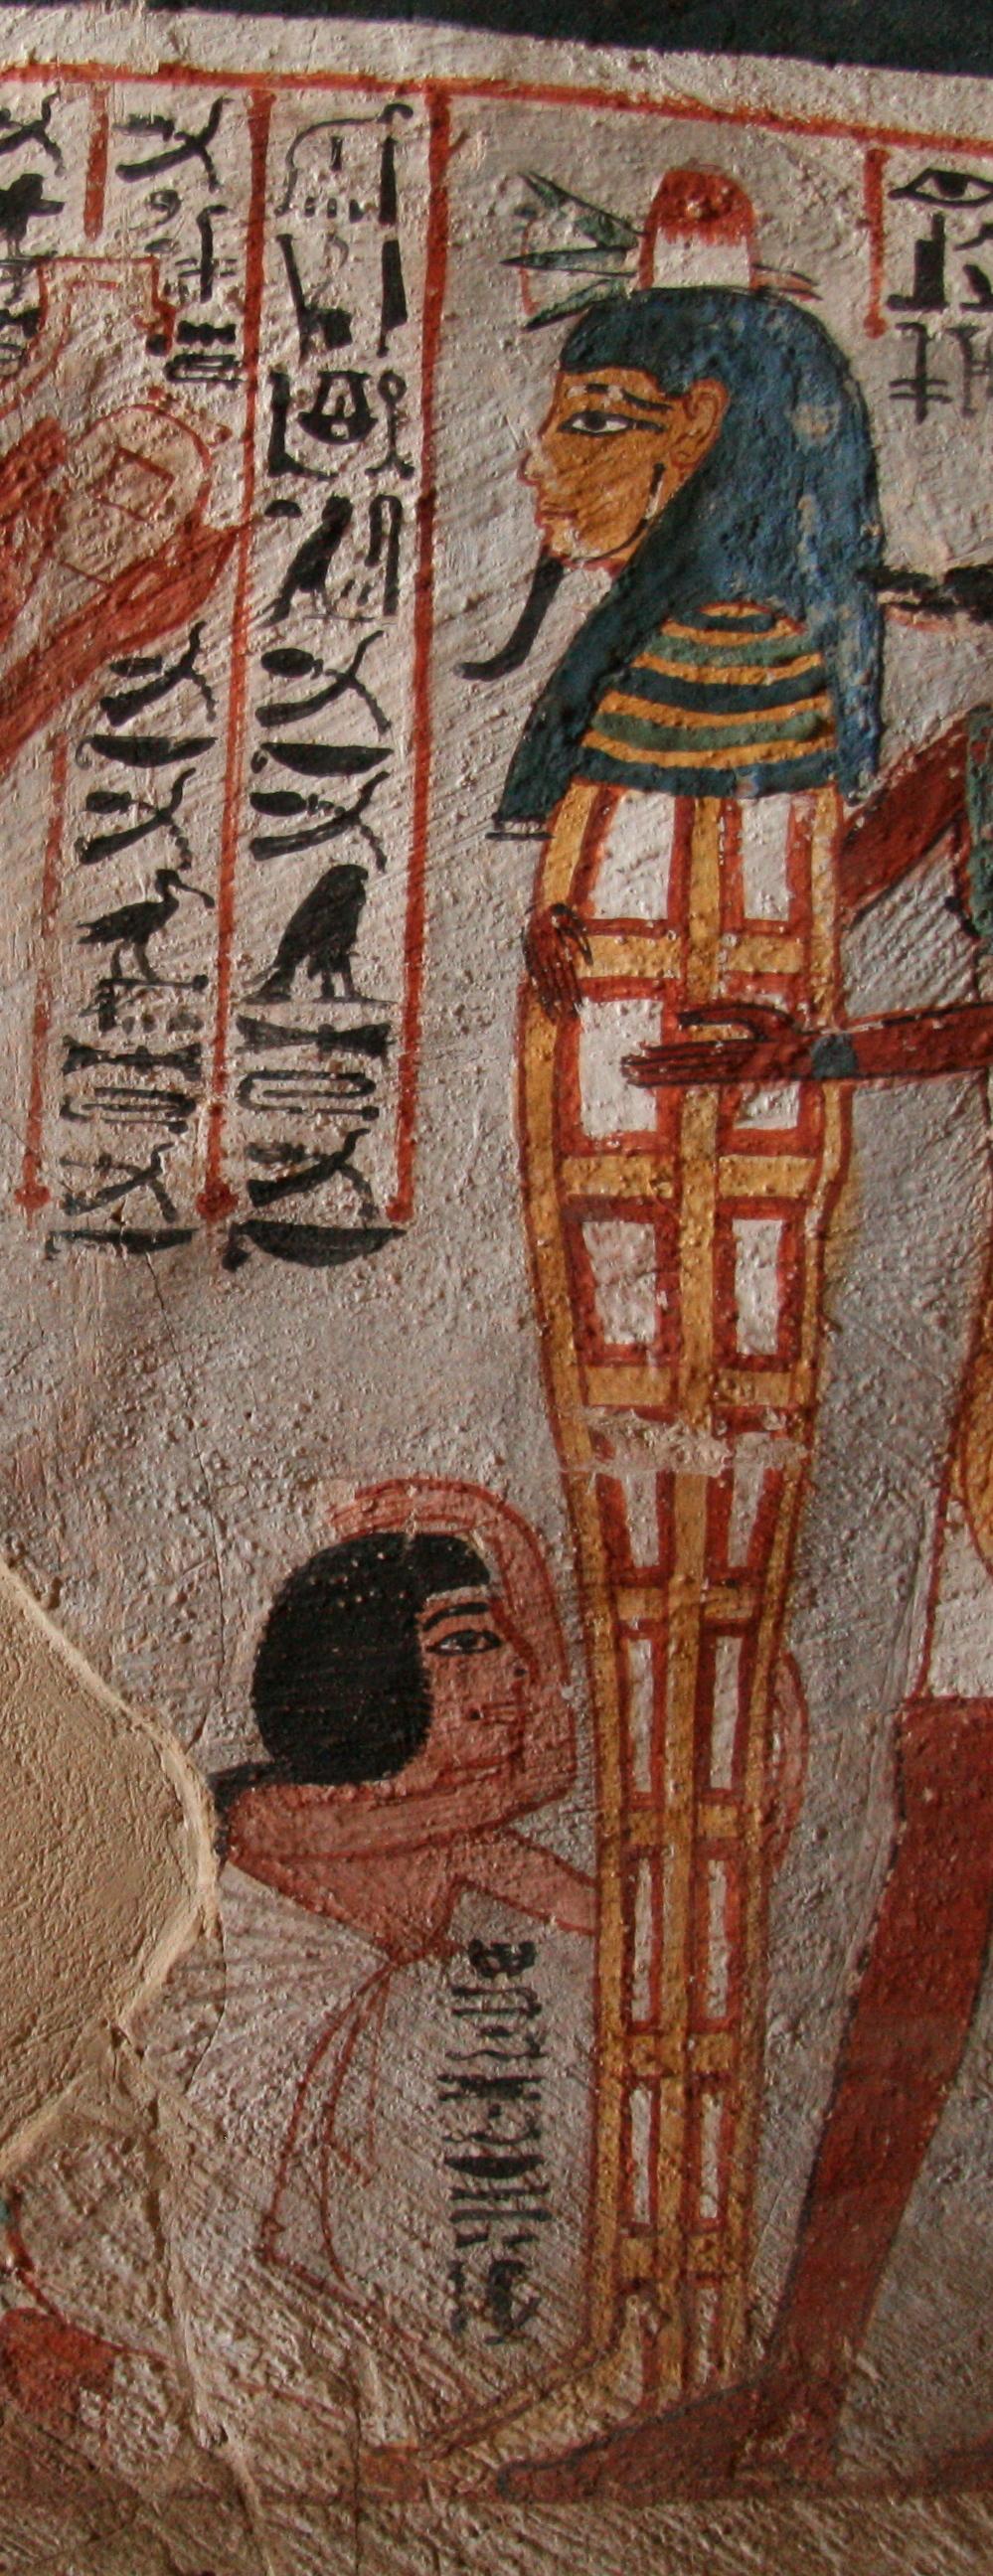 Ancient Egyptian Inventions song (karaoke) | History | La ...